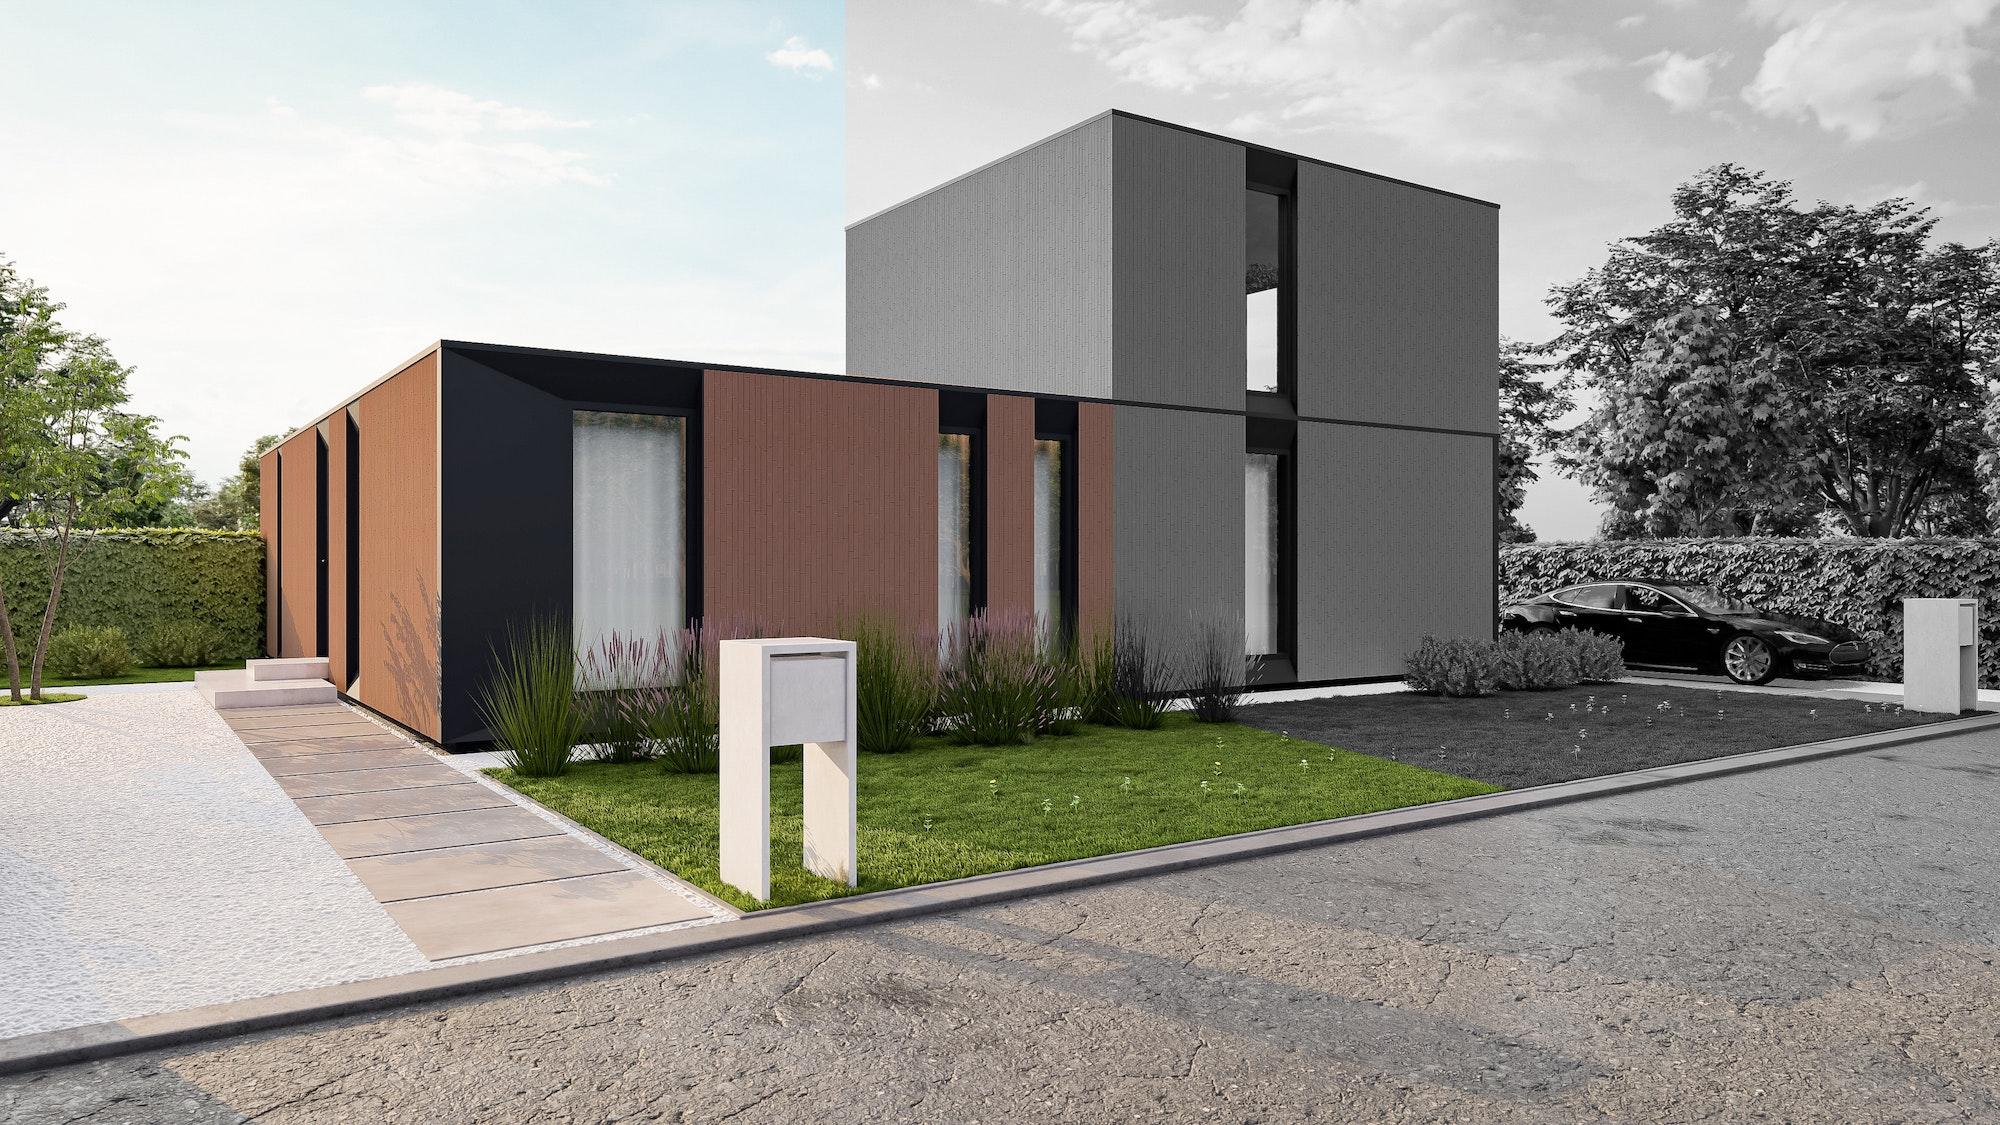 Nieuwbouw houtskelet Balen Ruiterweg woning 3